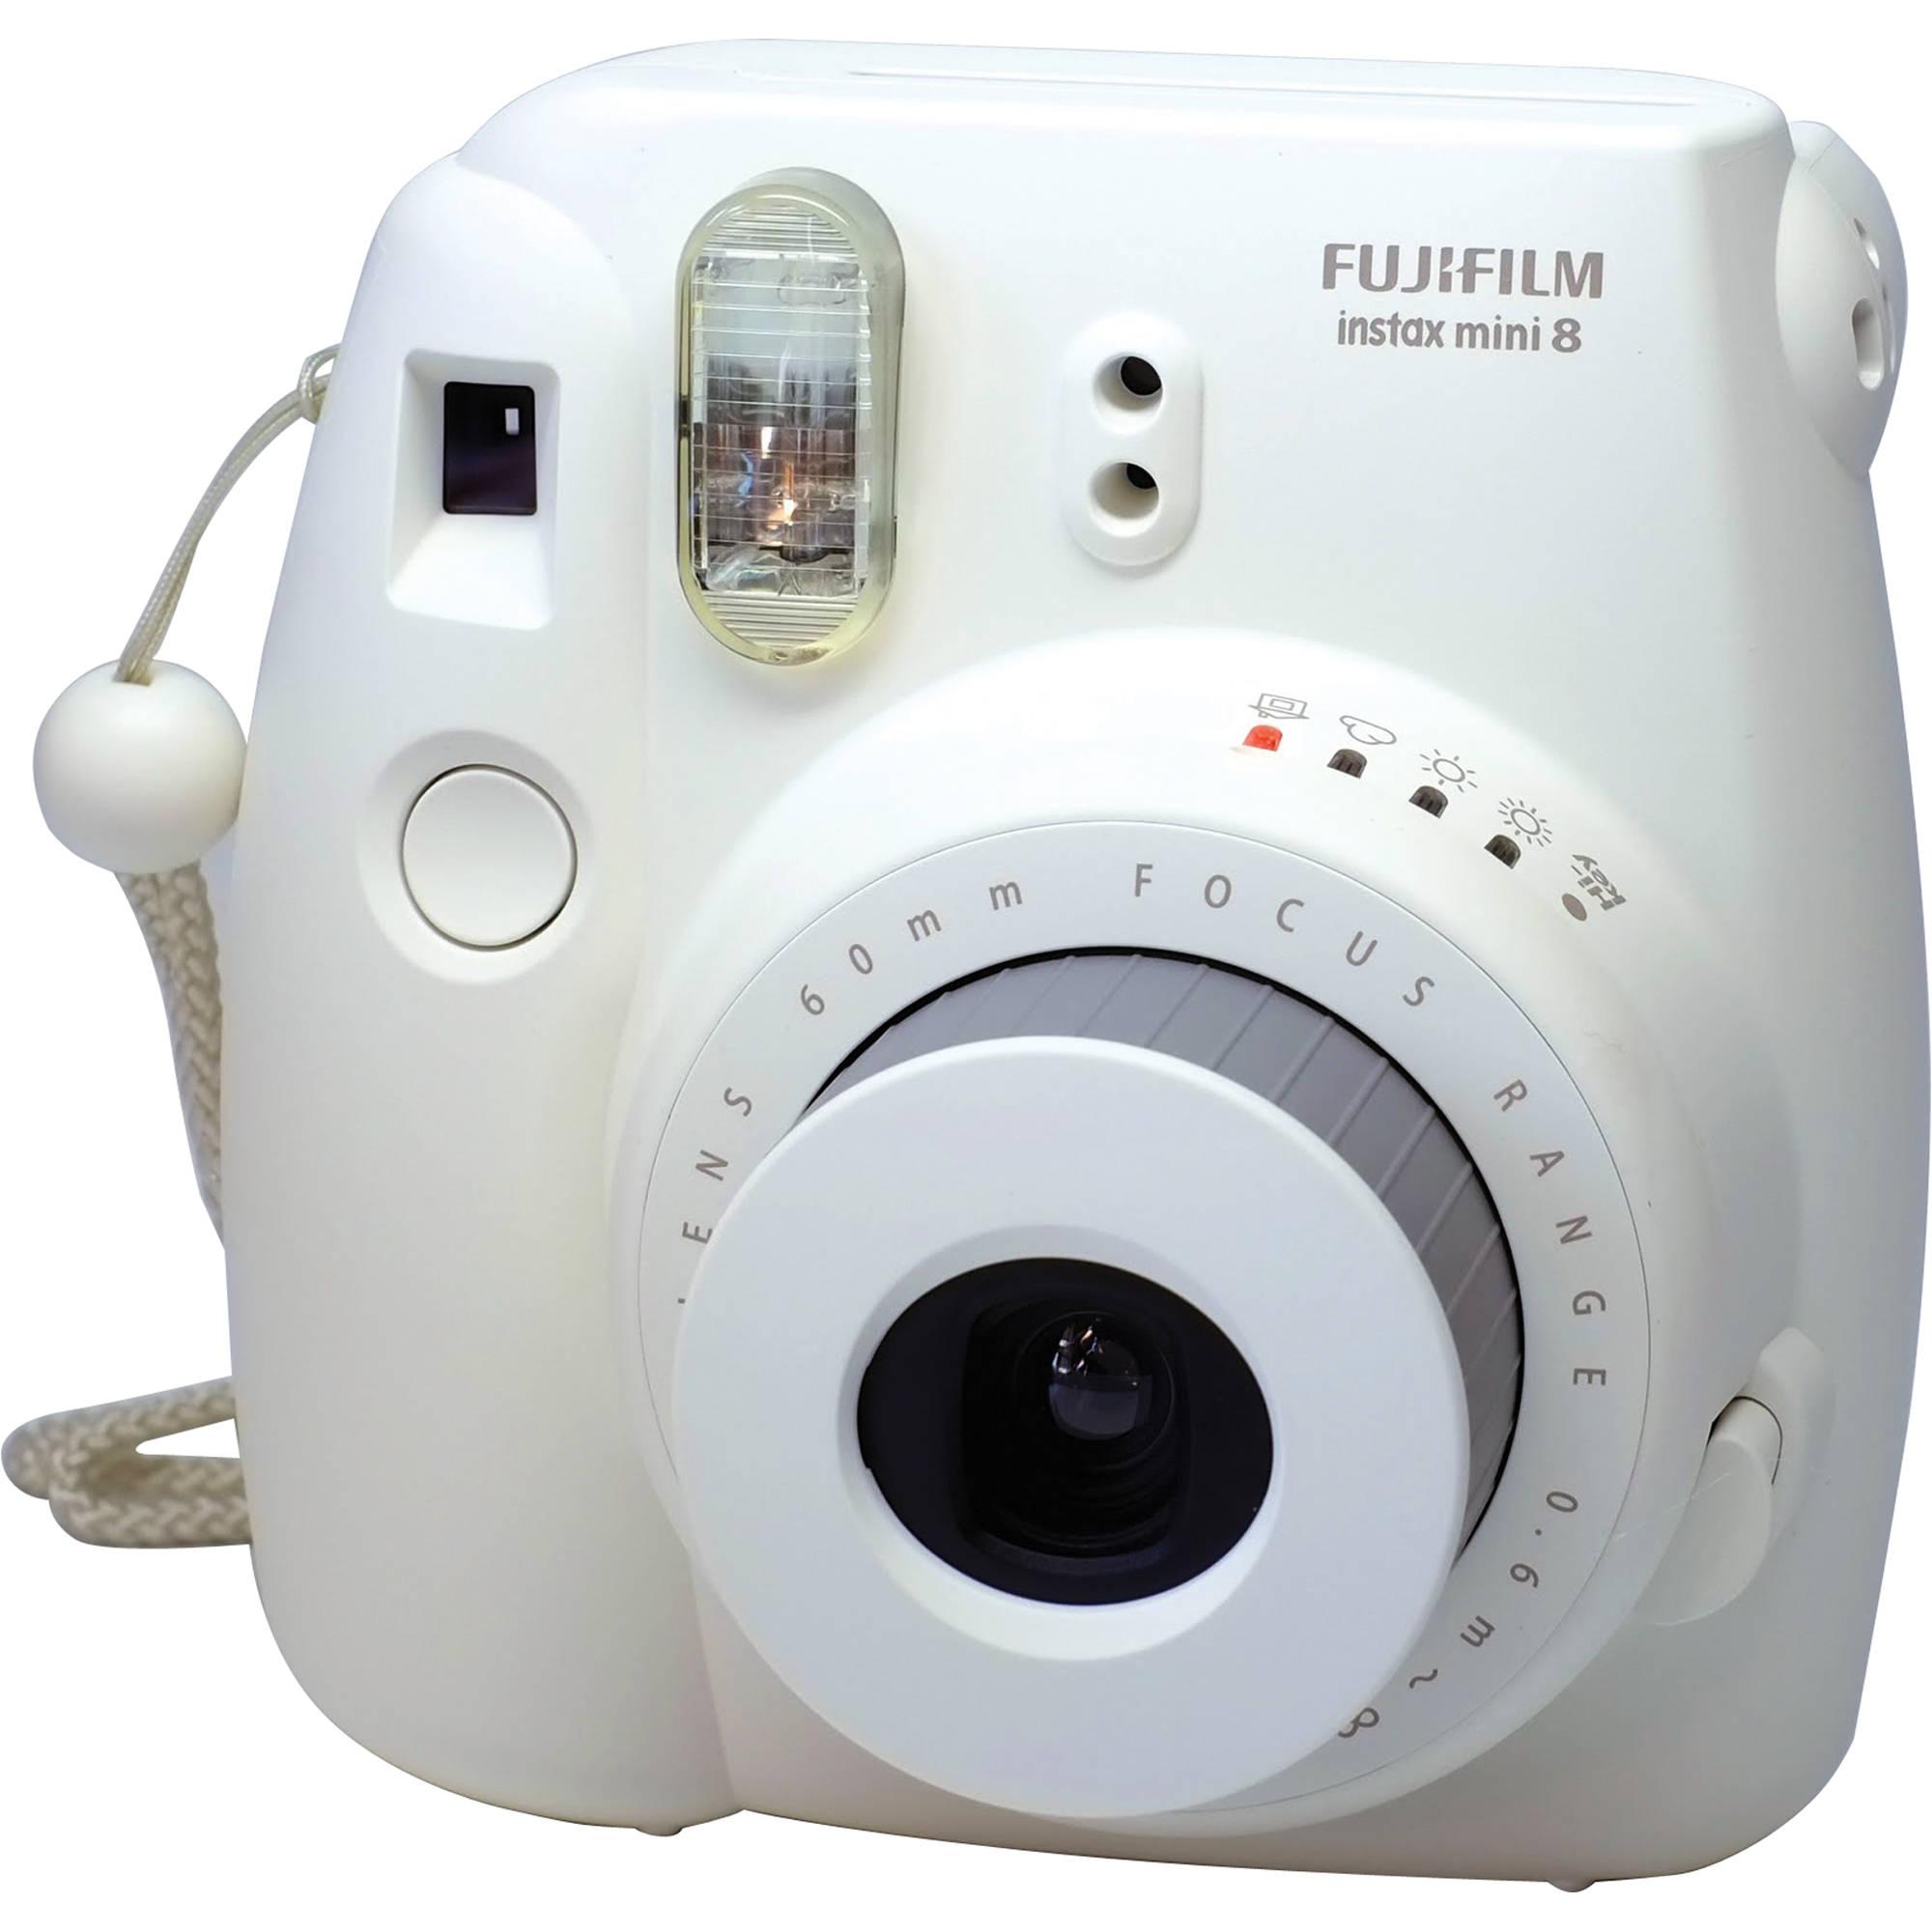 Fujifilm INSTAX Mini 8 Instant Film Camera (White) 16273398 B&H